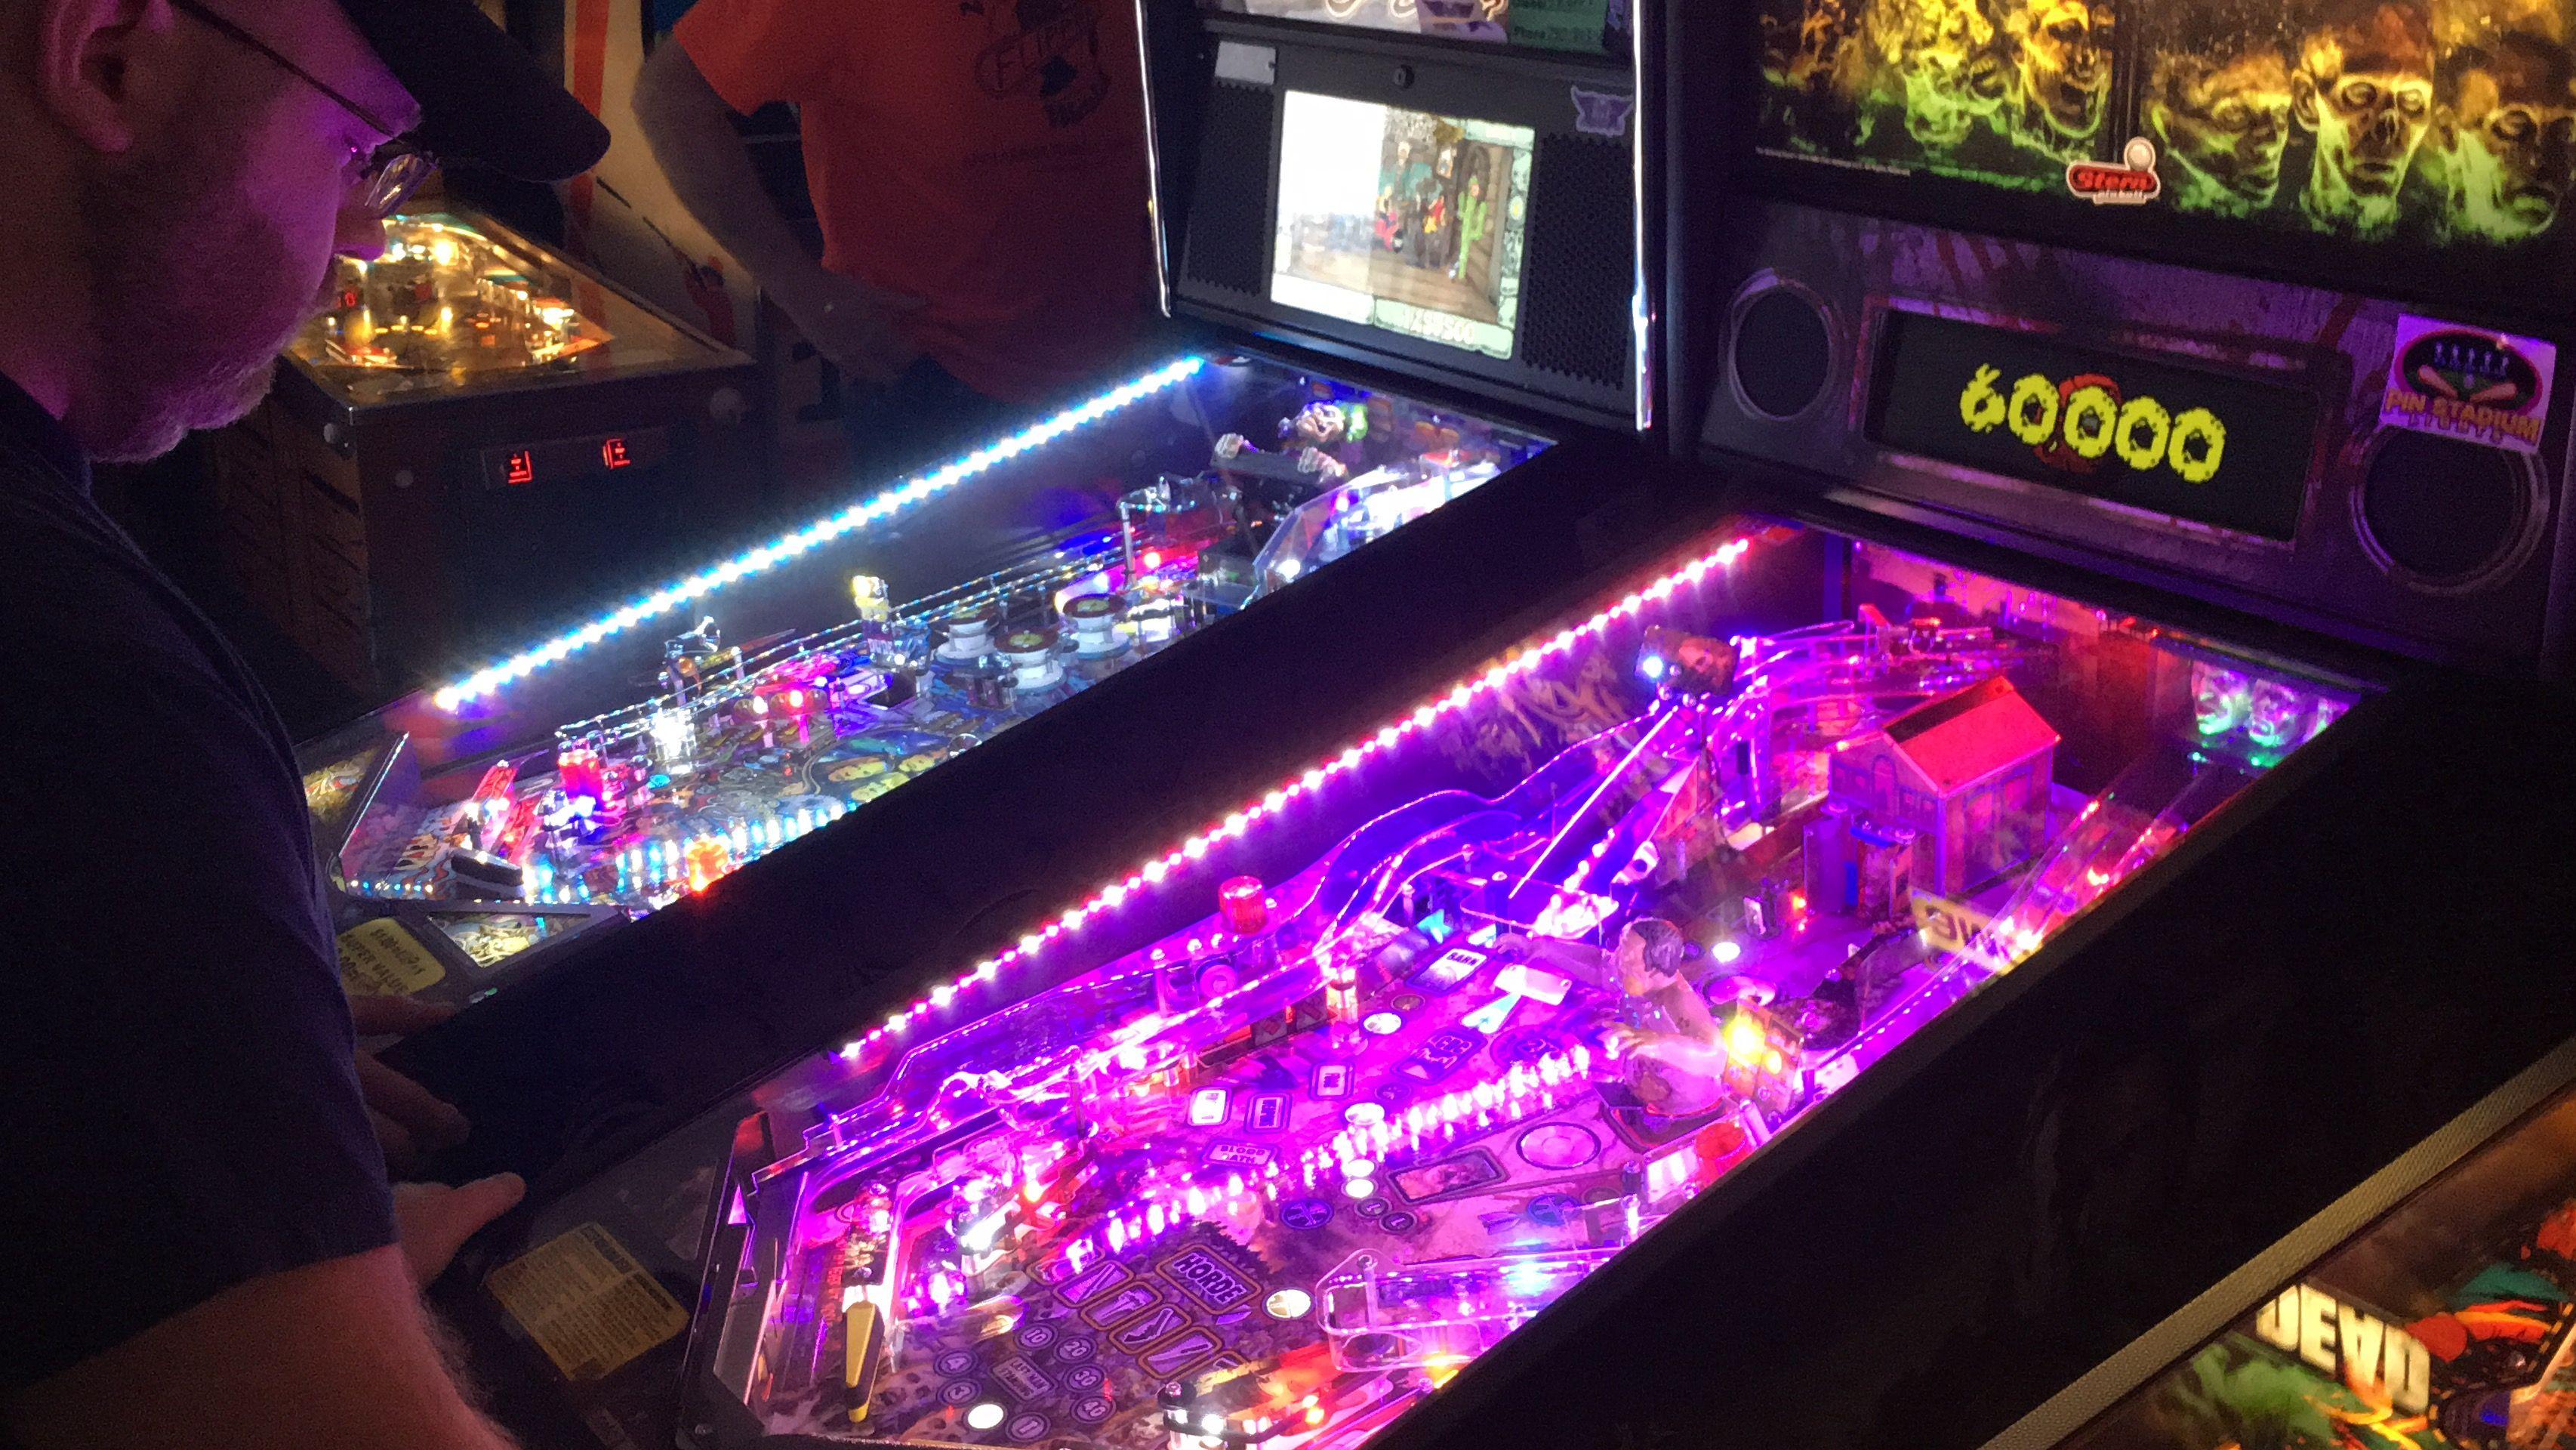 The Walking Dead Premium with Pin Stadium LED lighting kit